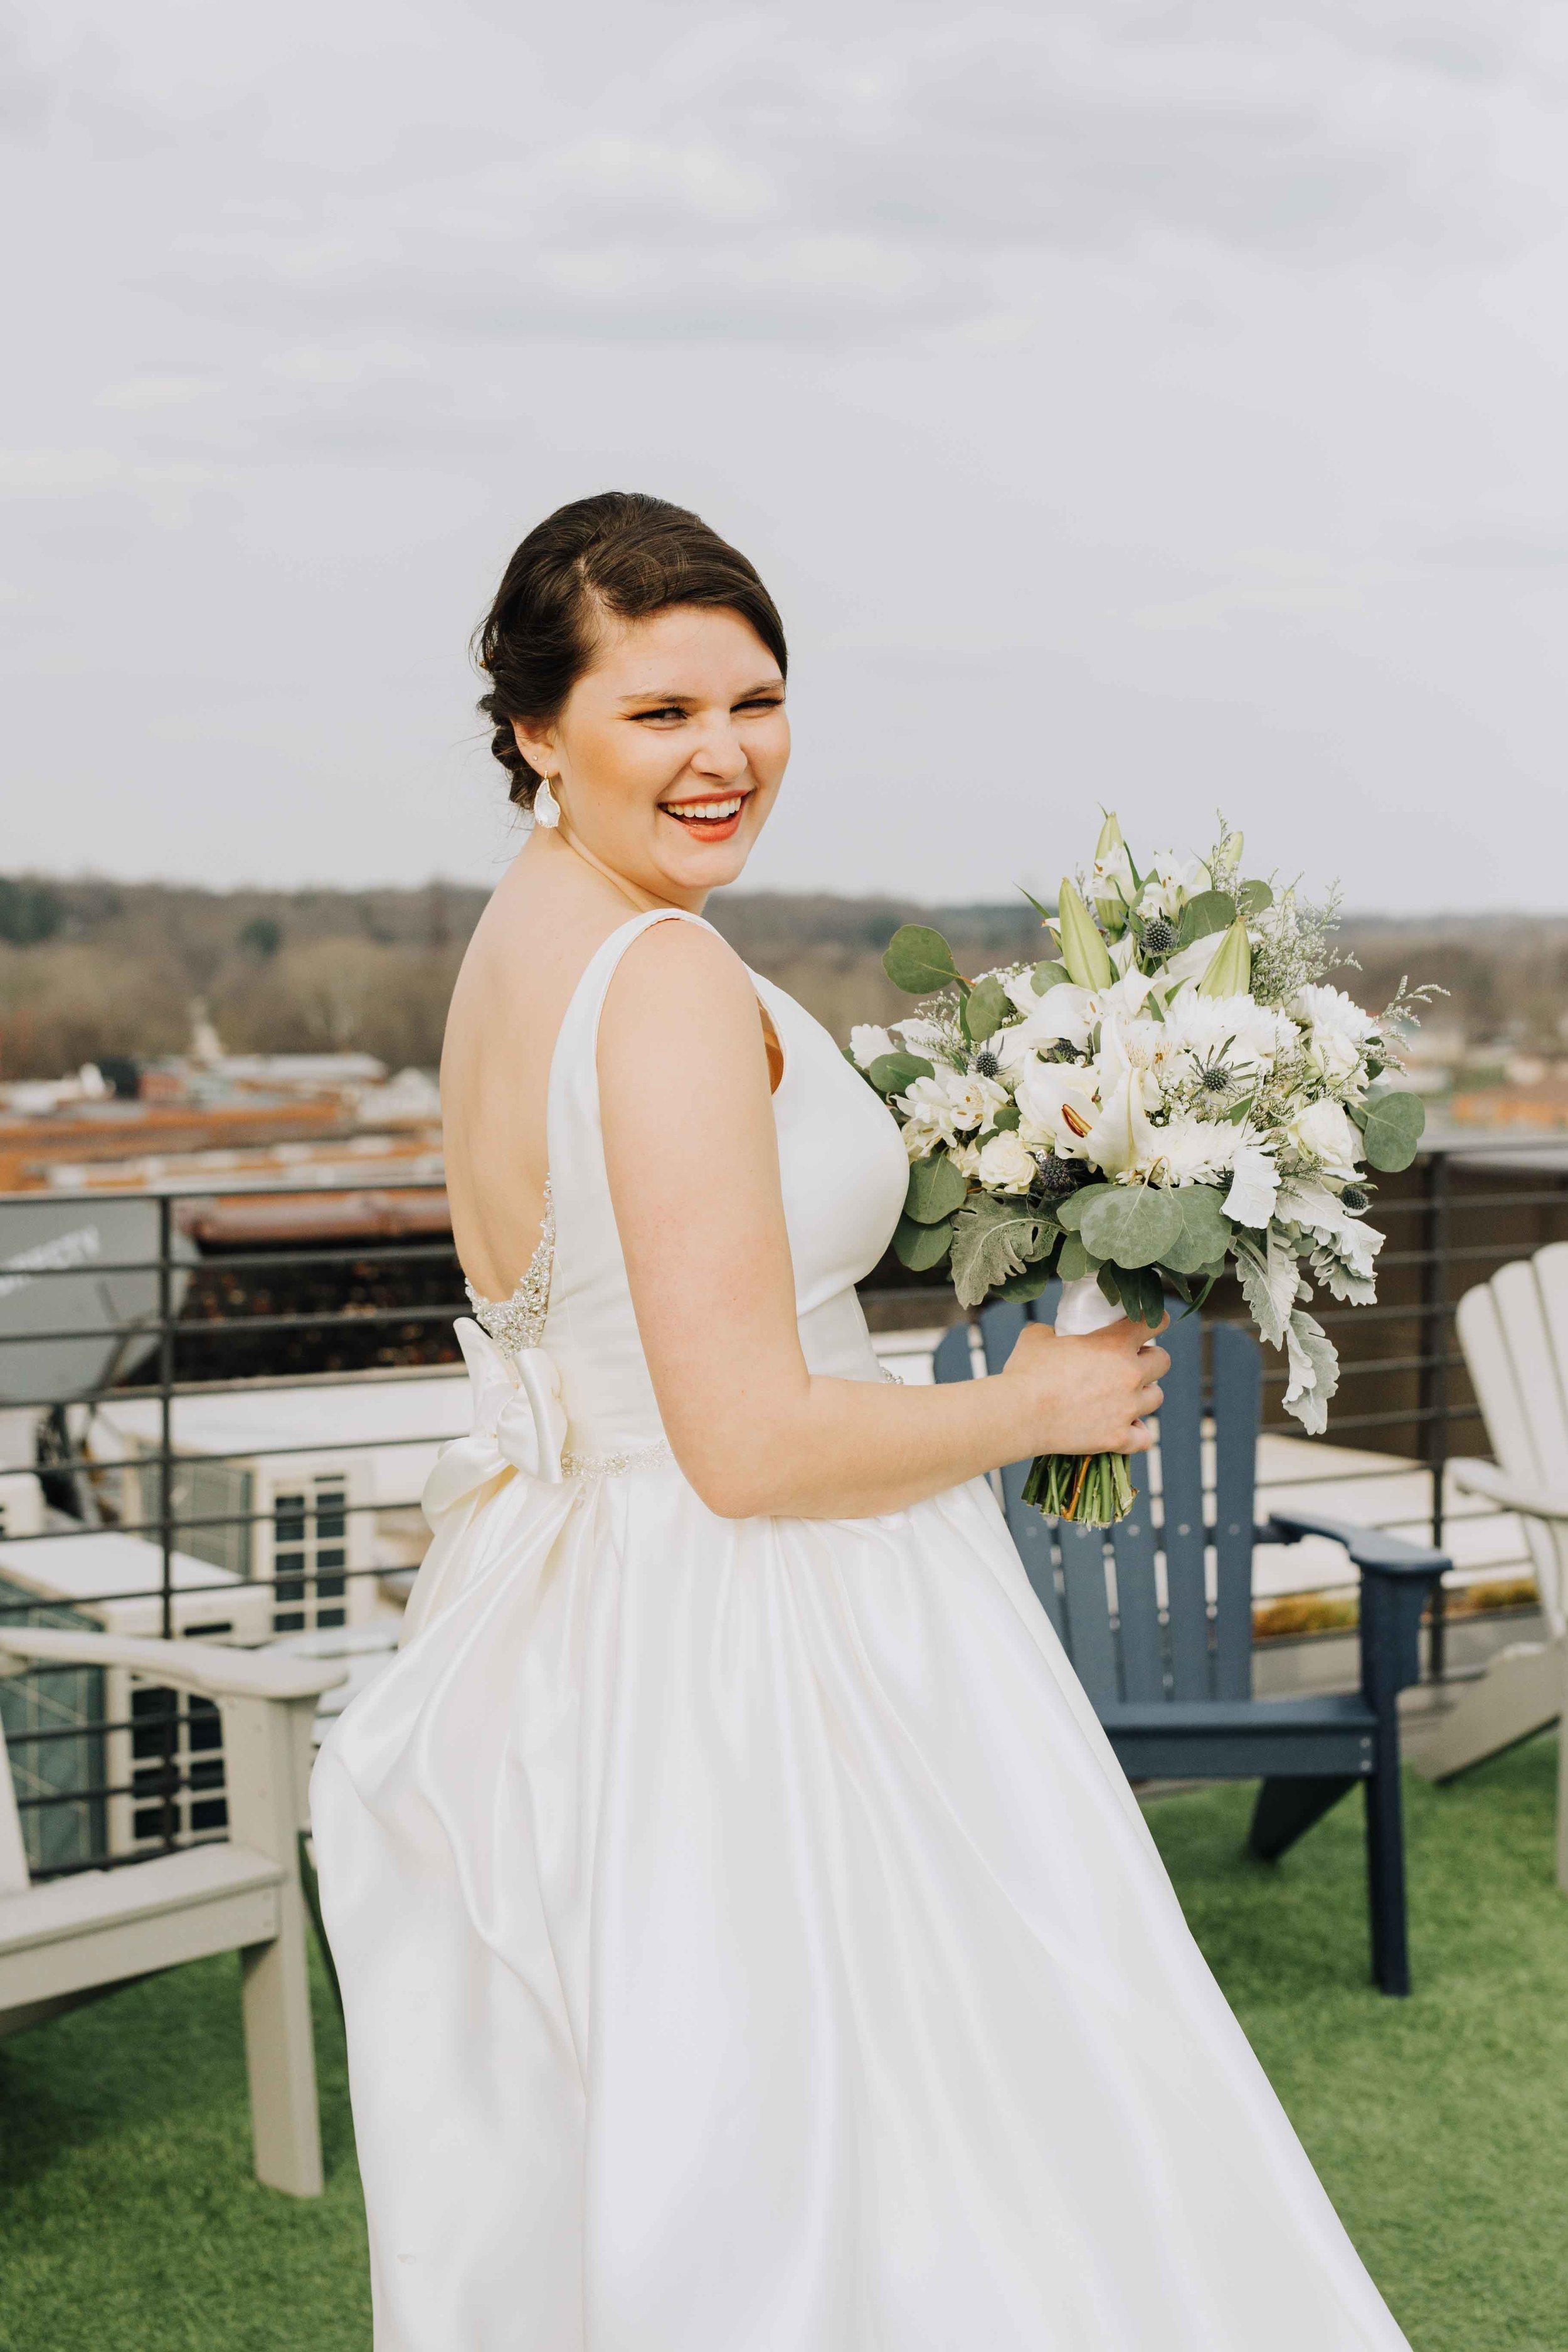 Farmville-Virginia-Wedding-Hotel-Weynoke-Downtown-Jacqueline-Waters-Photography-Detailed- (628).jpg